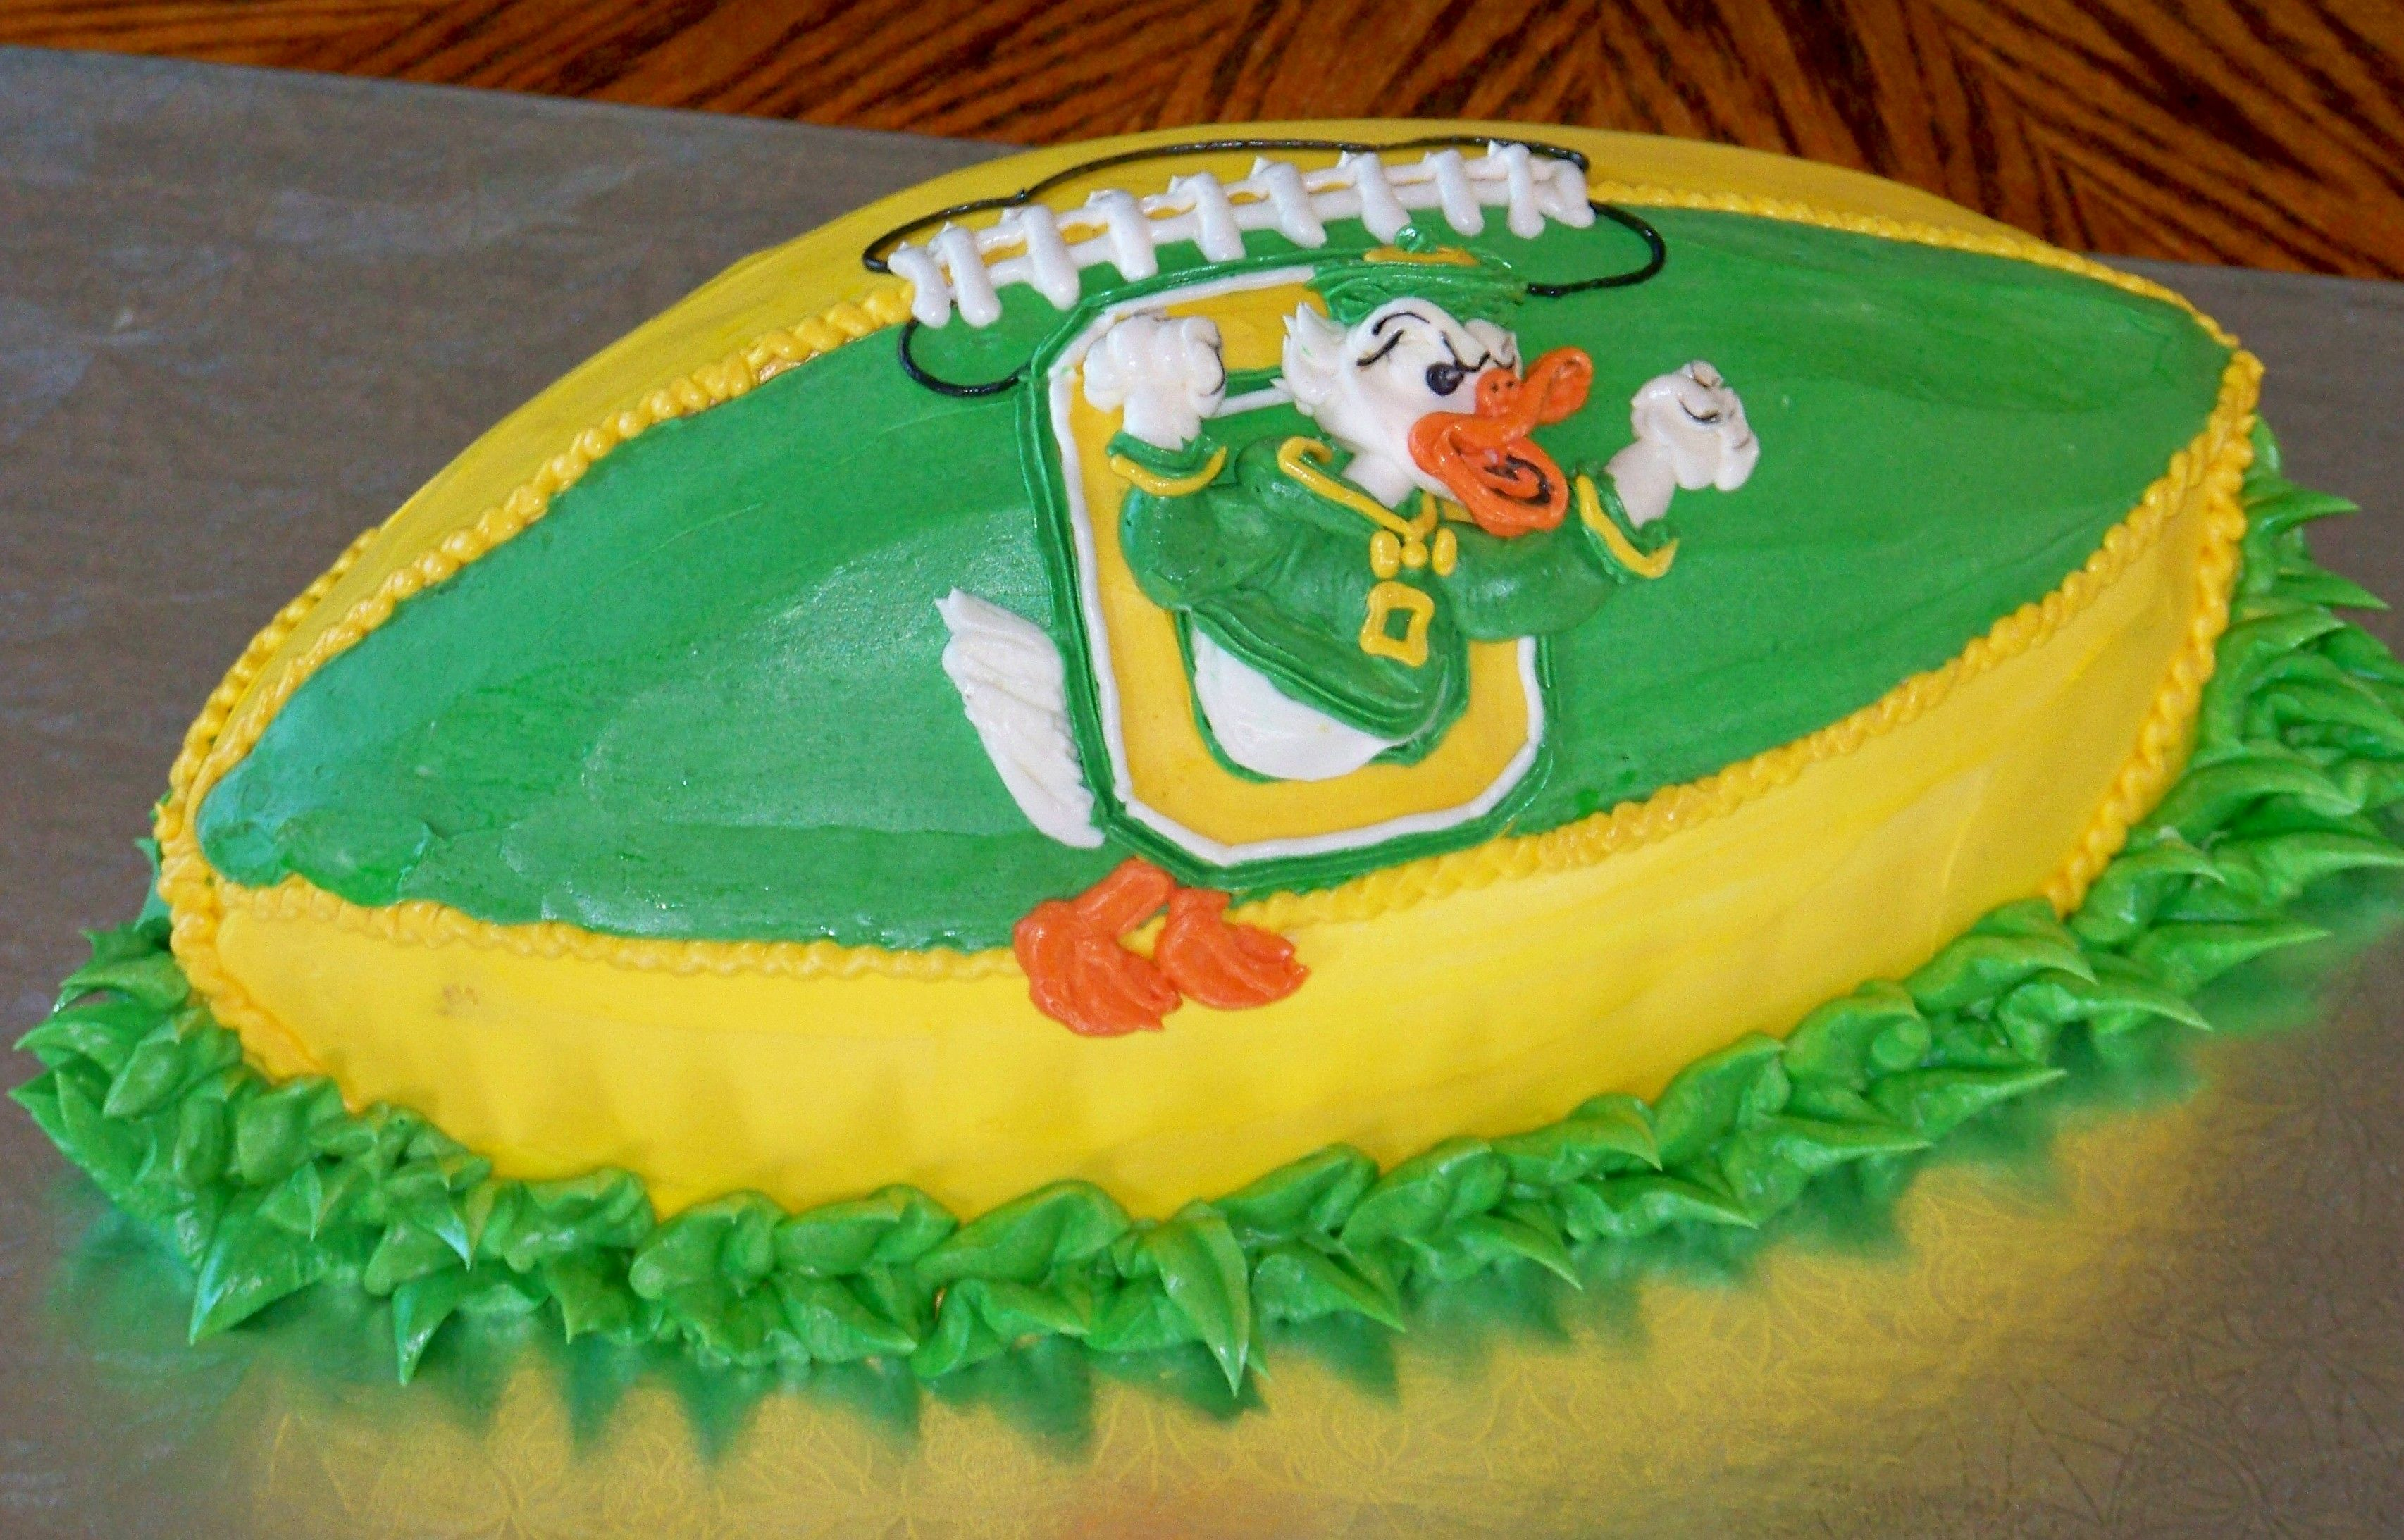 Oregon Fighting Duck Cake